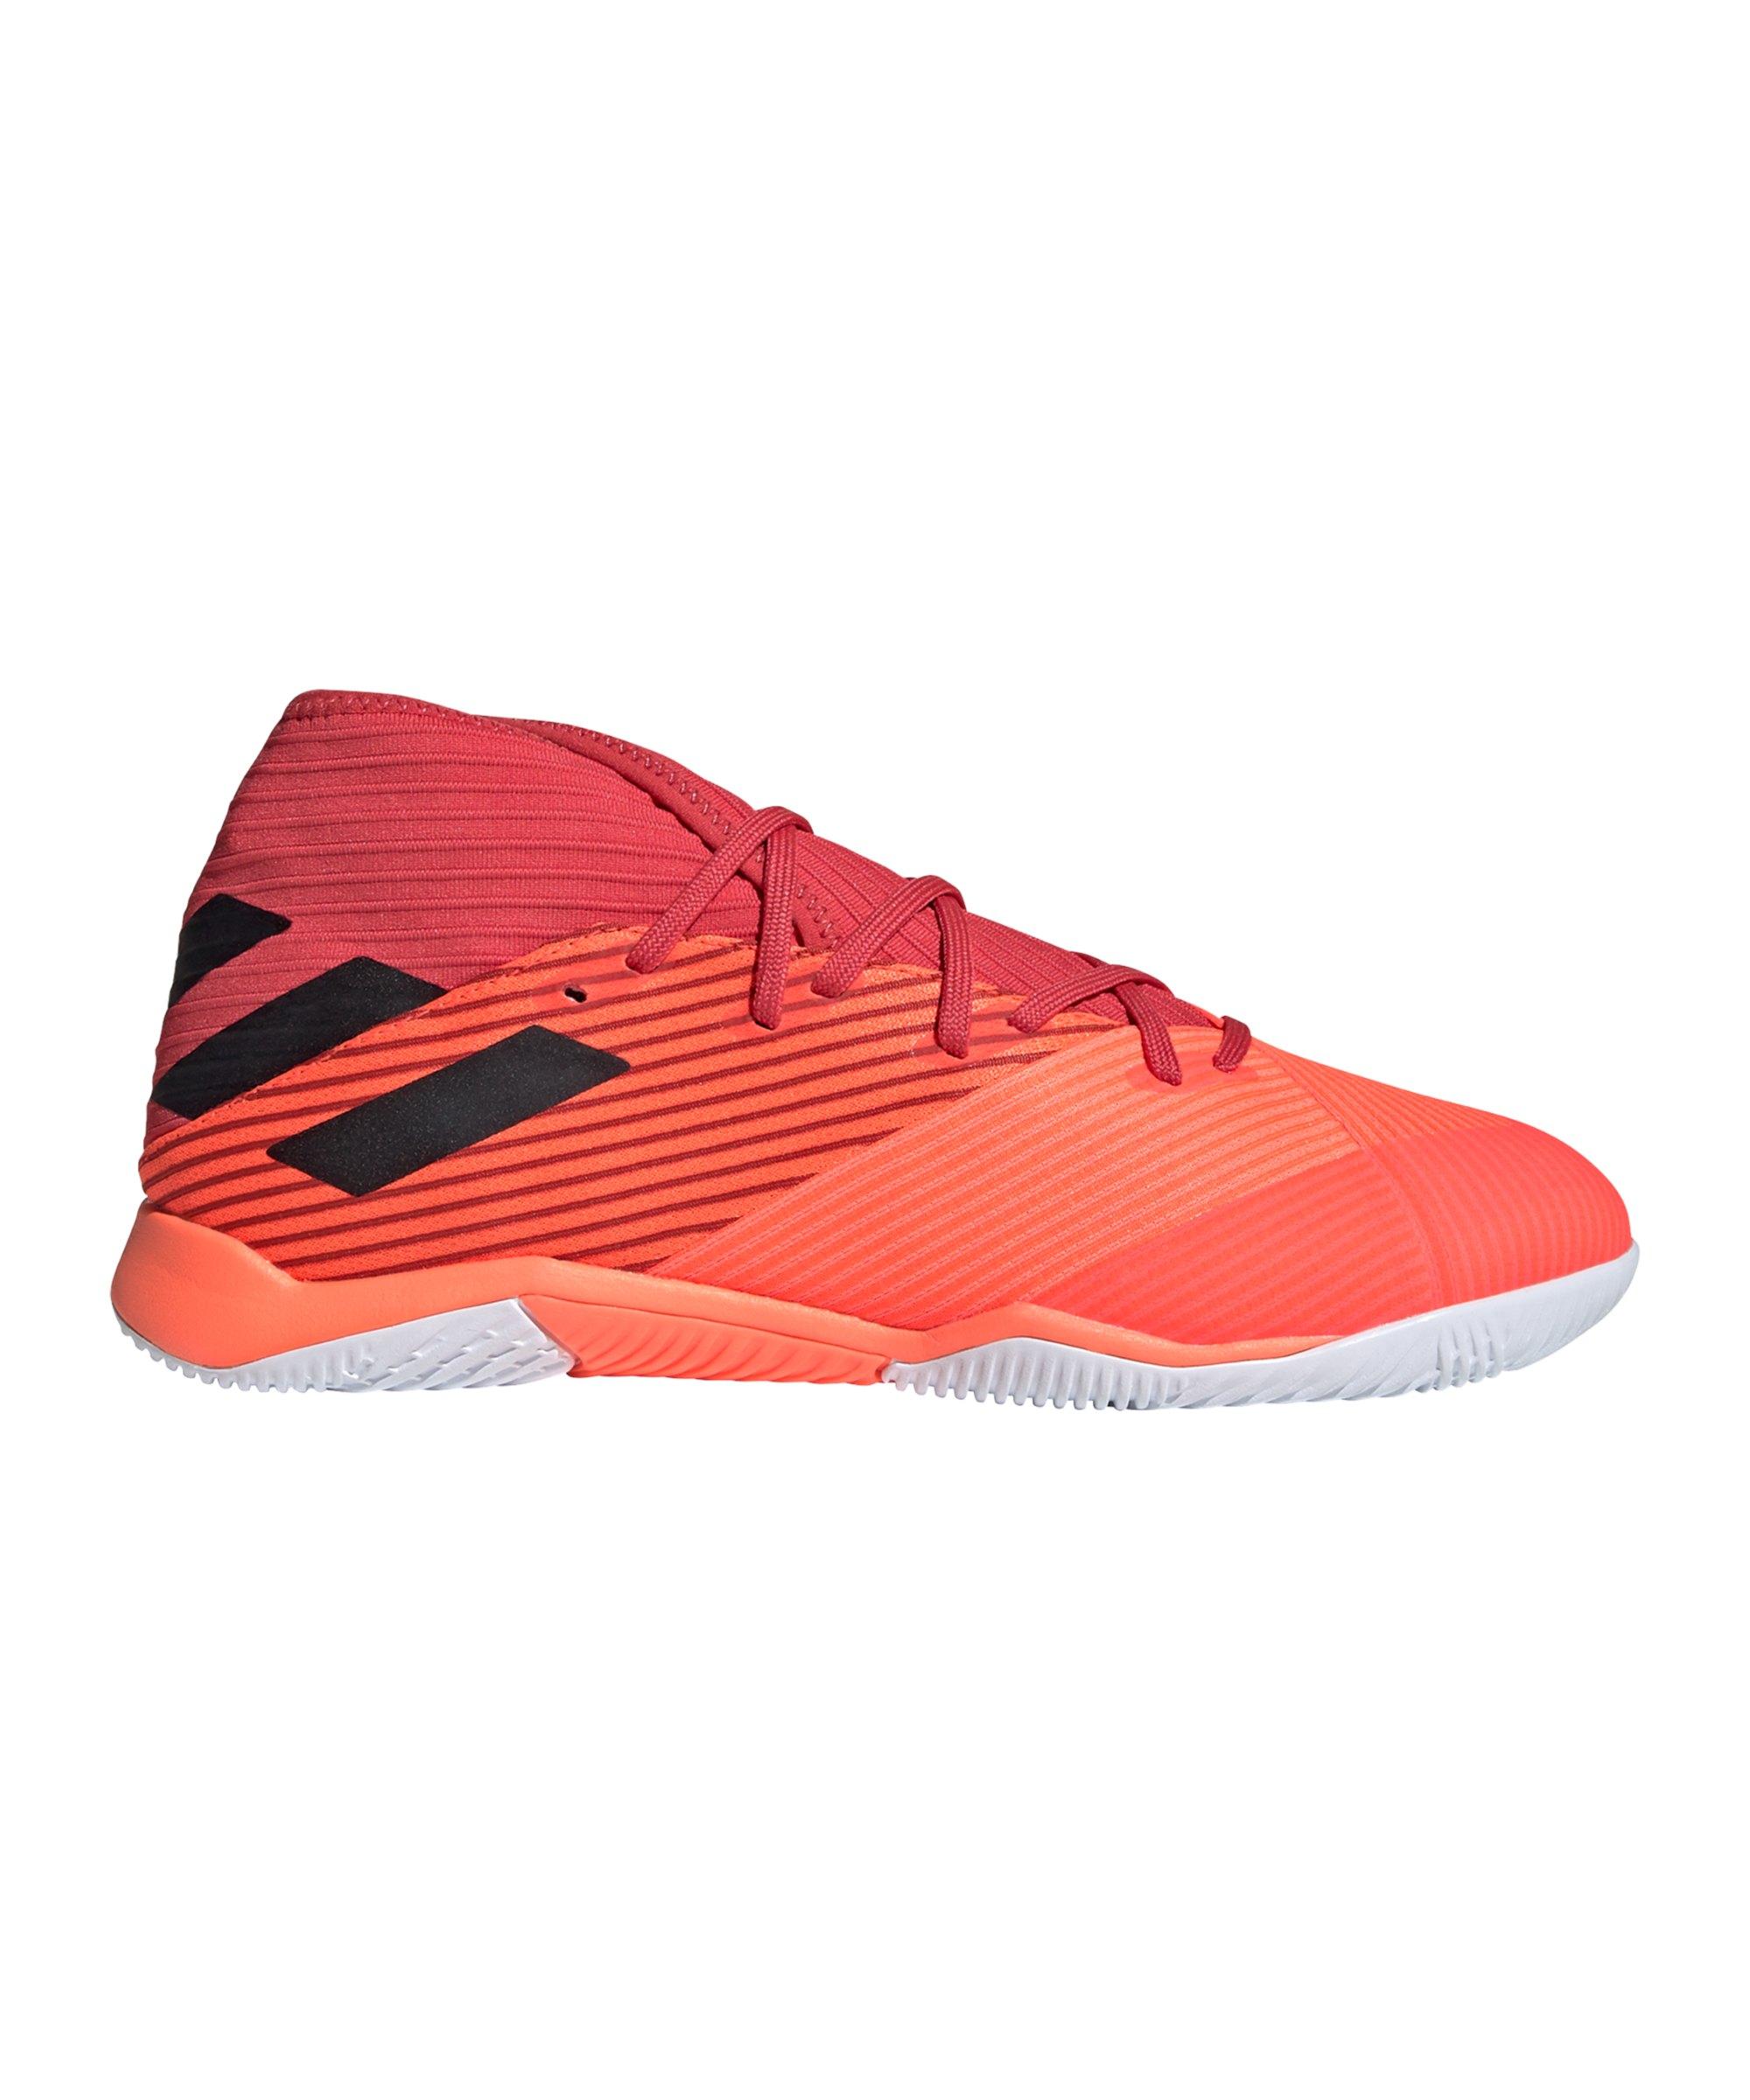 adidas NEMEZIZ Inflight 19.3 IN Halle Orange - orange